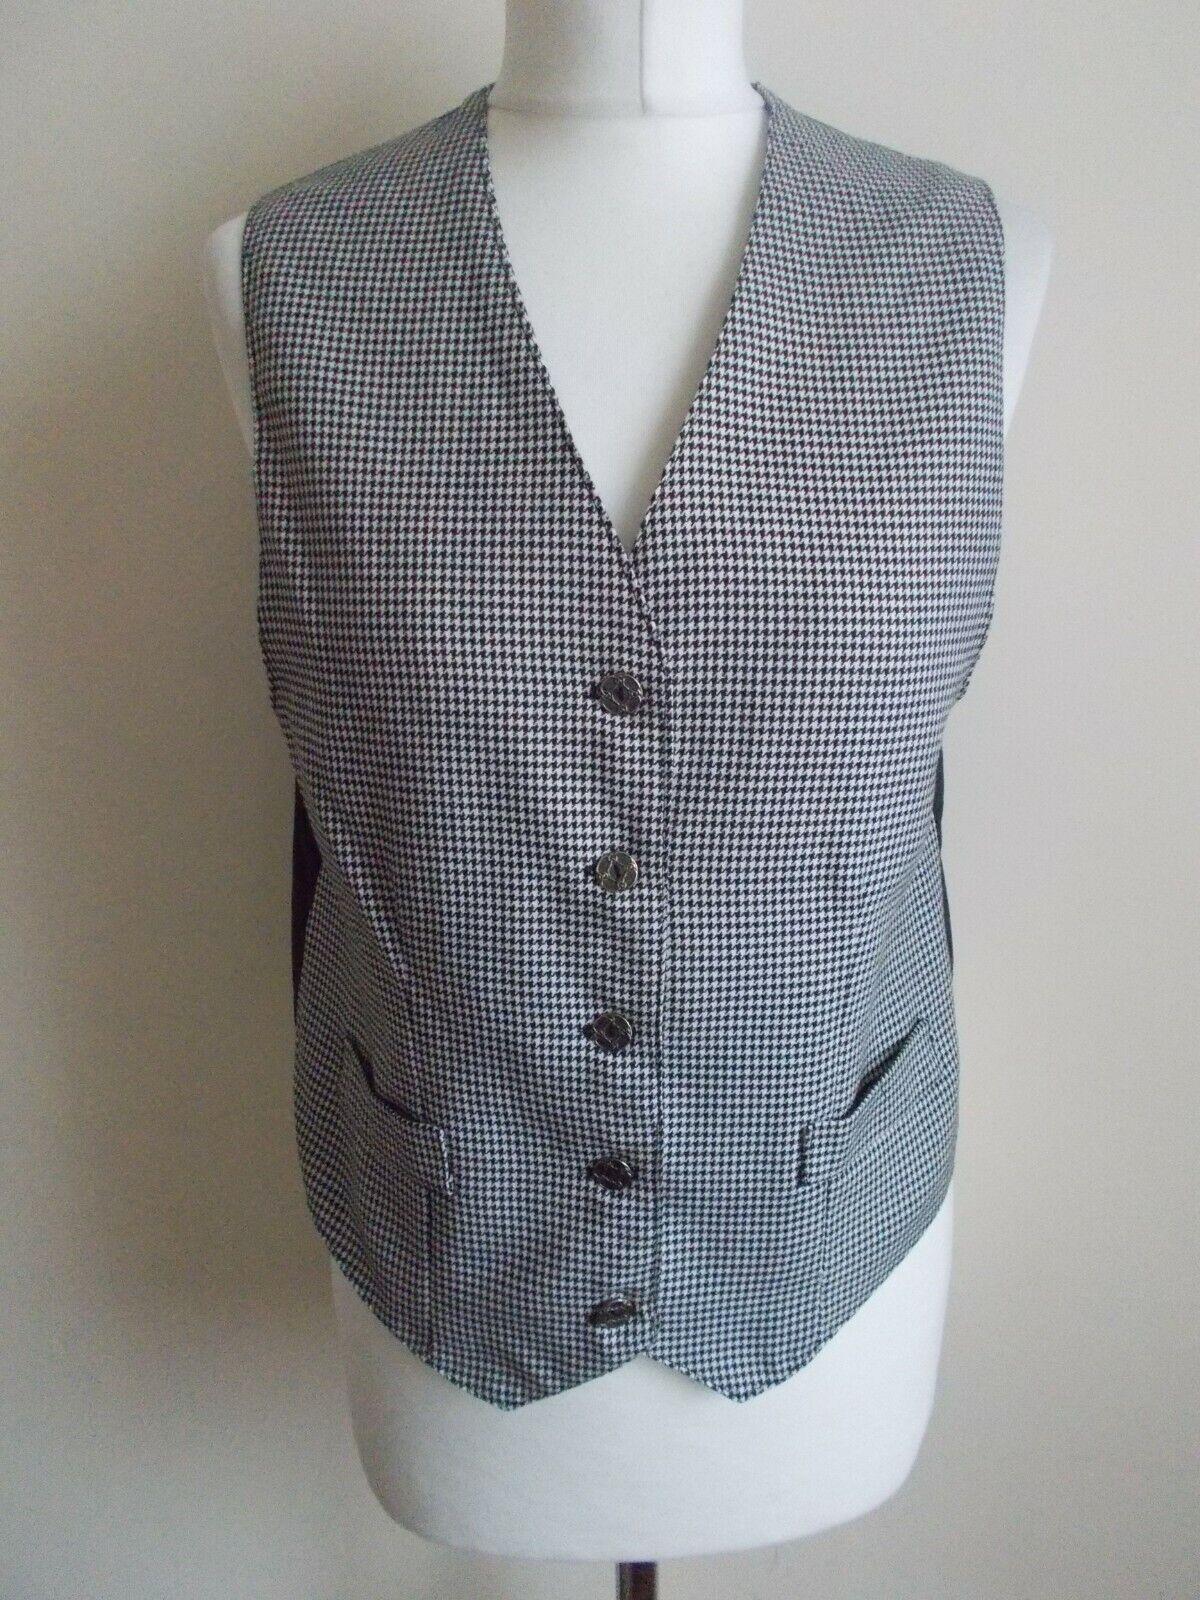 Women's Black White Dogtooth V Neck Waistcoat Vest By First Avenue Size 12